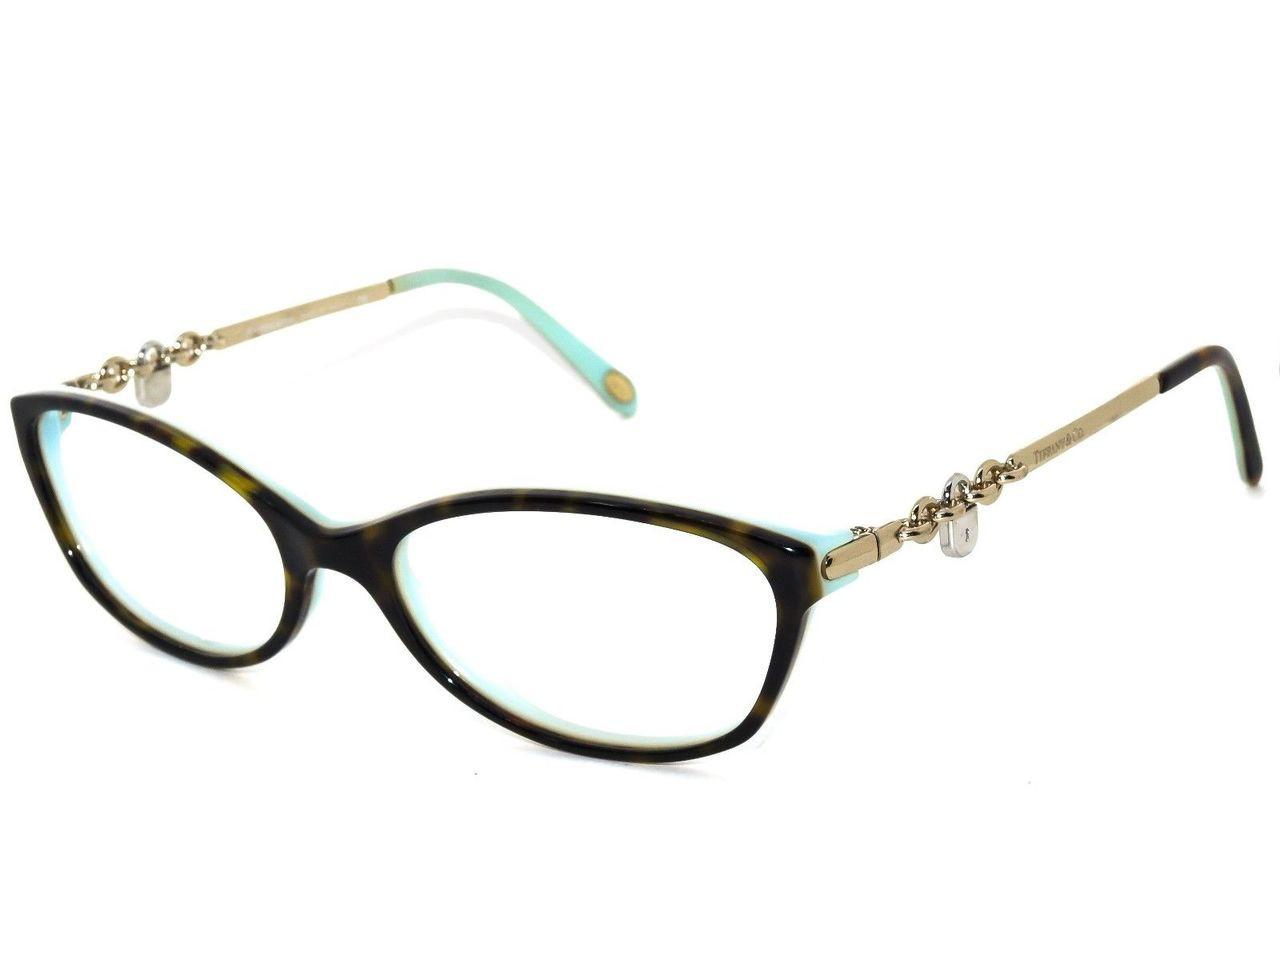 cec330b29363 TIFFANY Eyeglasses TF 2063 8134 Havana Blue 52MM - Elite Eyewear Studio